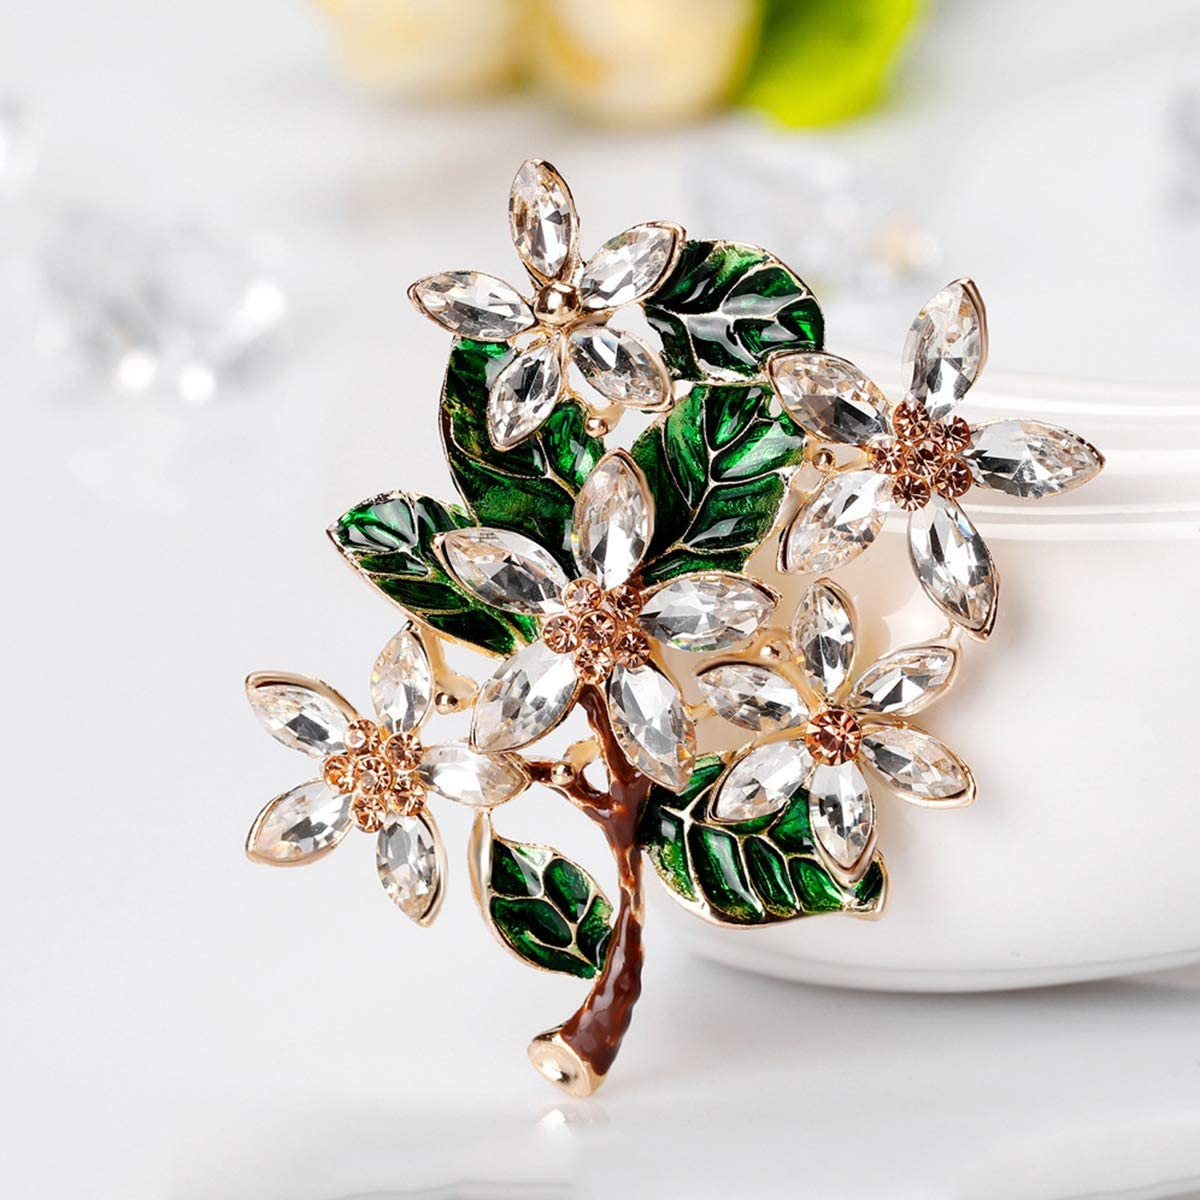 Mecool Broche en forme de fleurs Broches et /épingles Brillants de synth/èses brillantes Zircone cubique